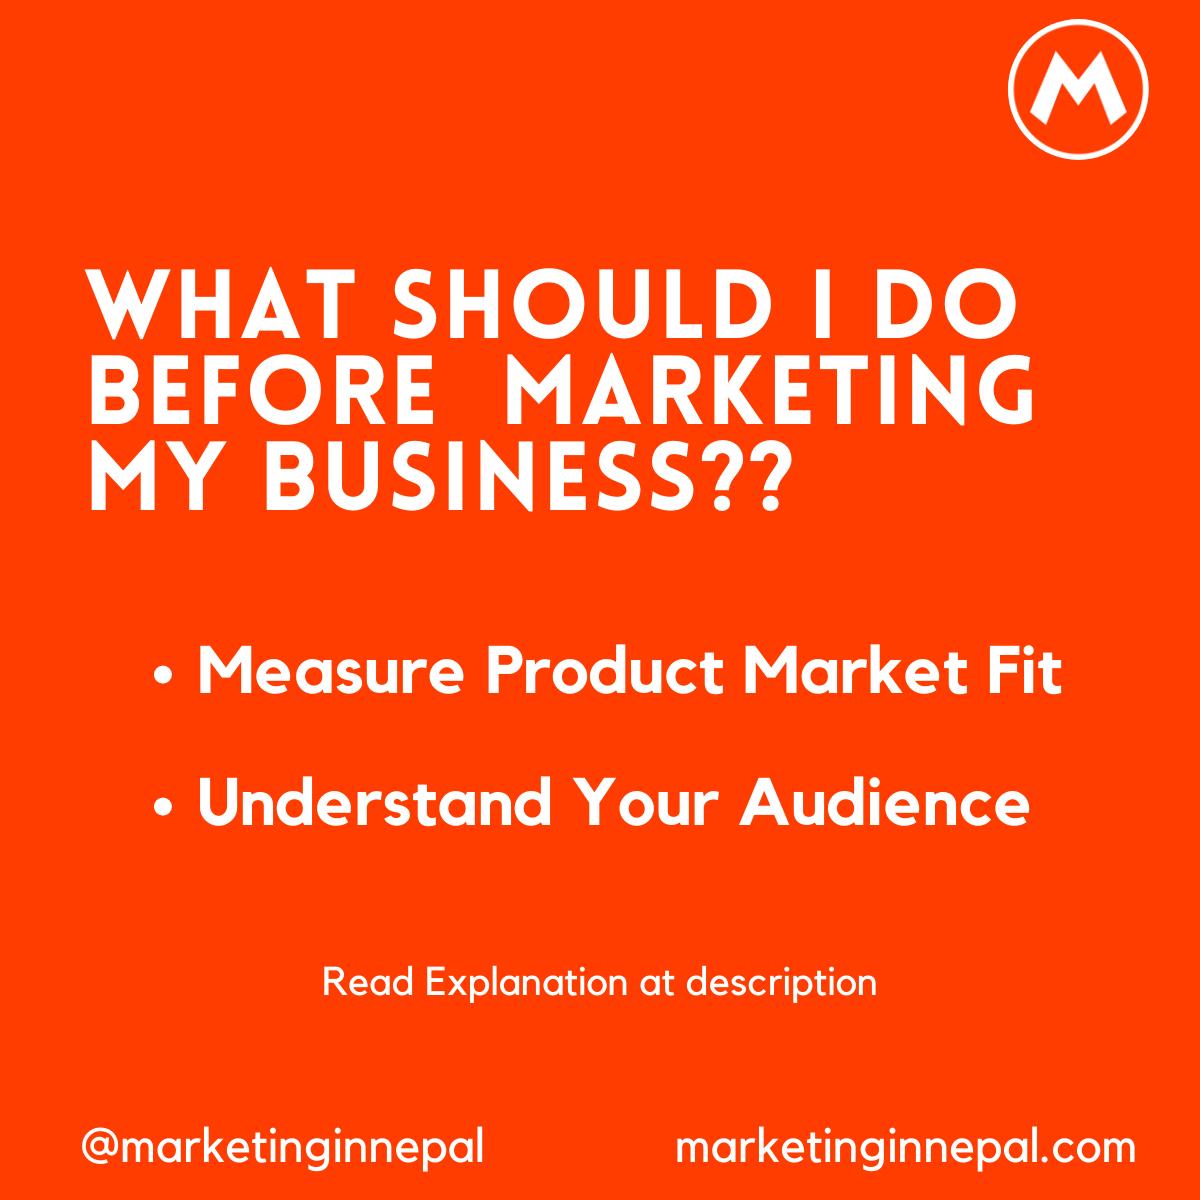 Before Marketing